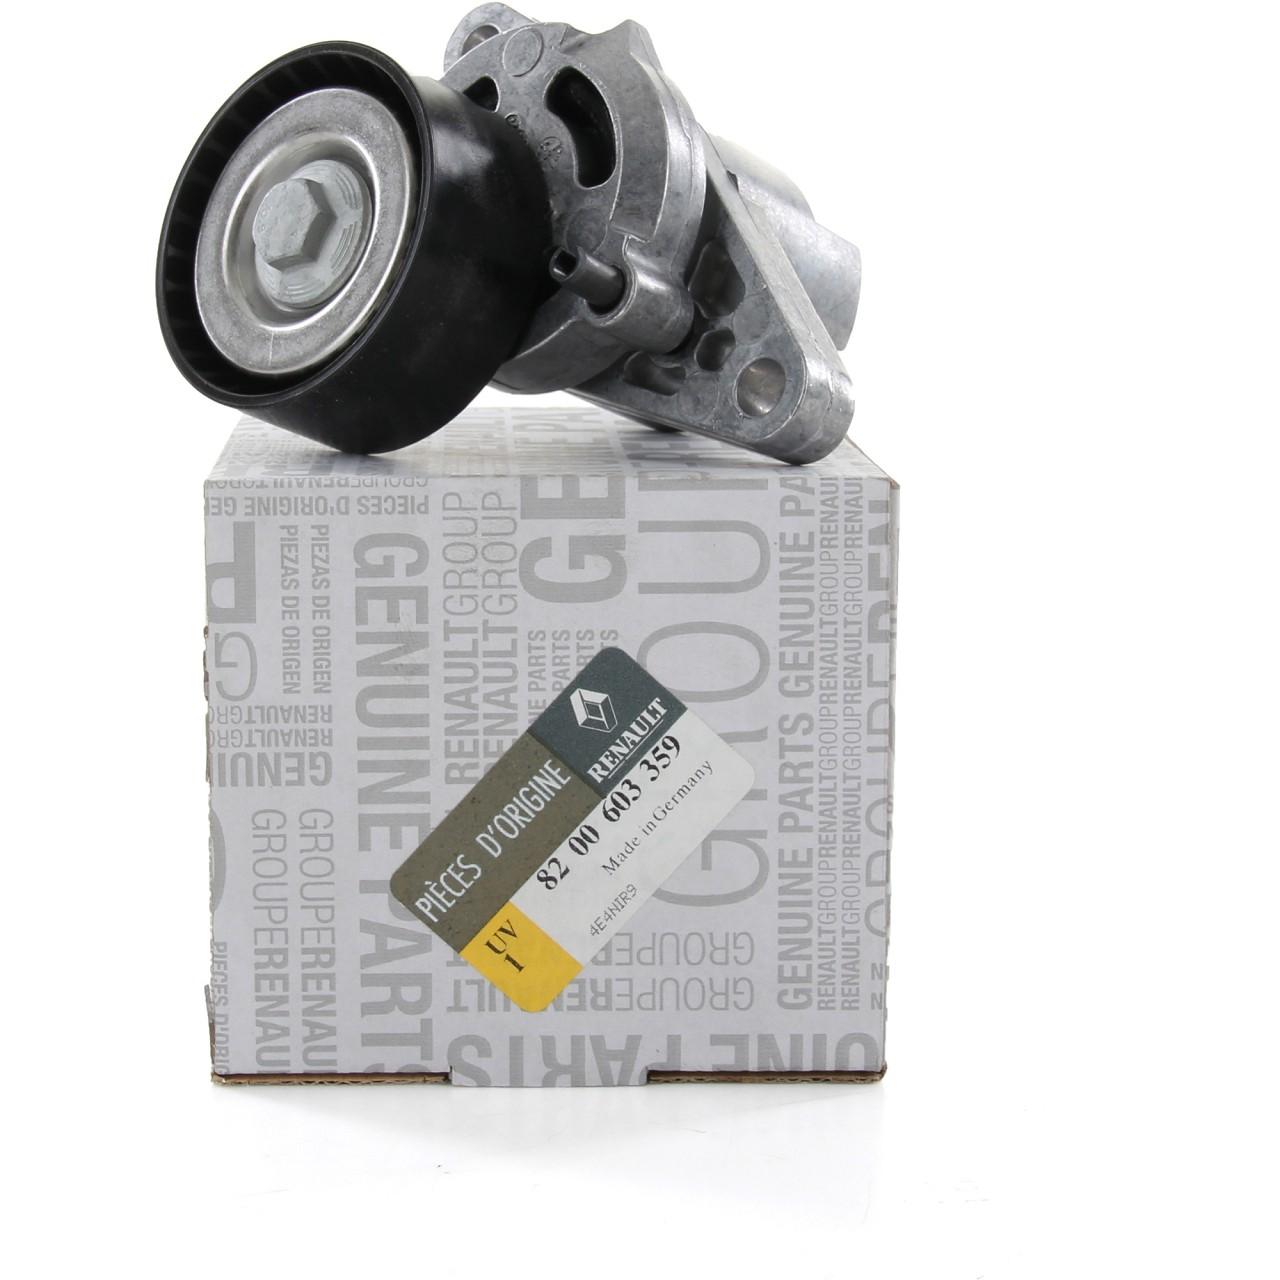 ORIGINAL Renault Riemenspanner Keilrippenriemen Clio Espace Kangoo 8200603359